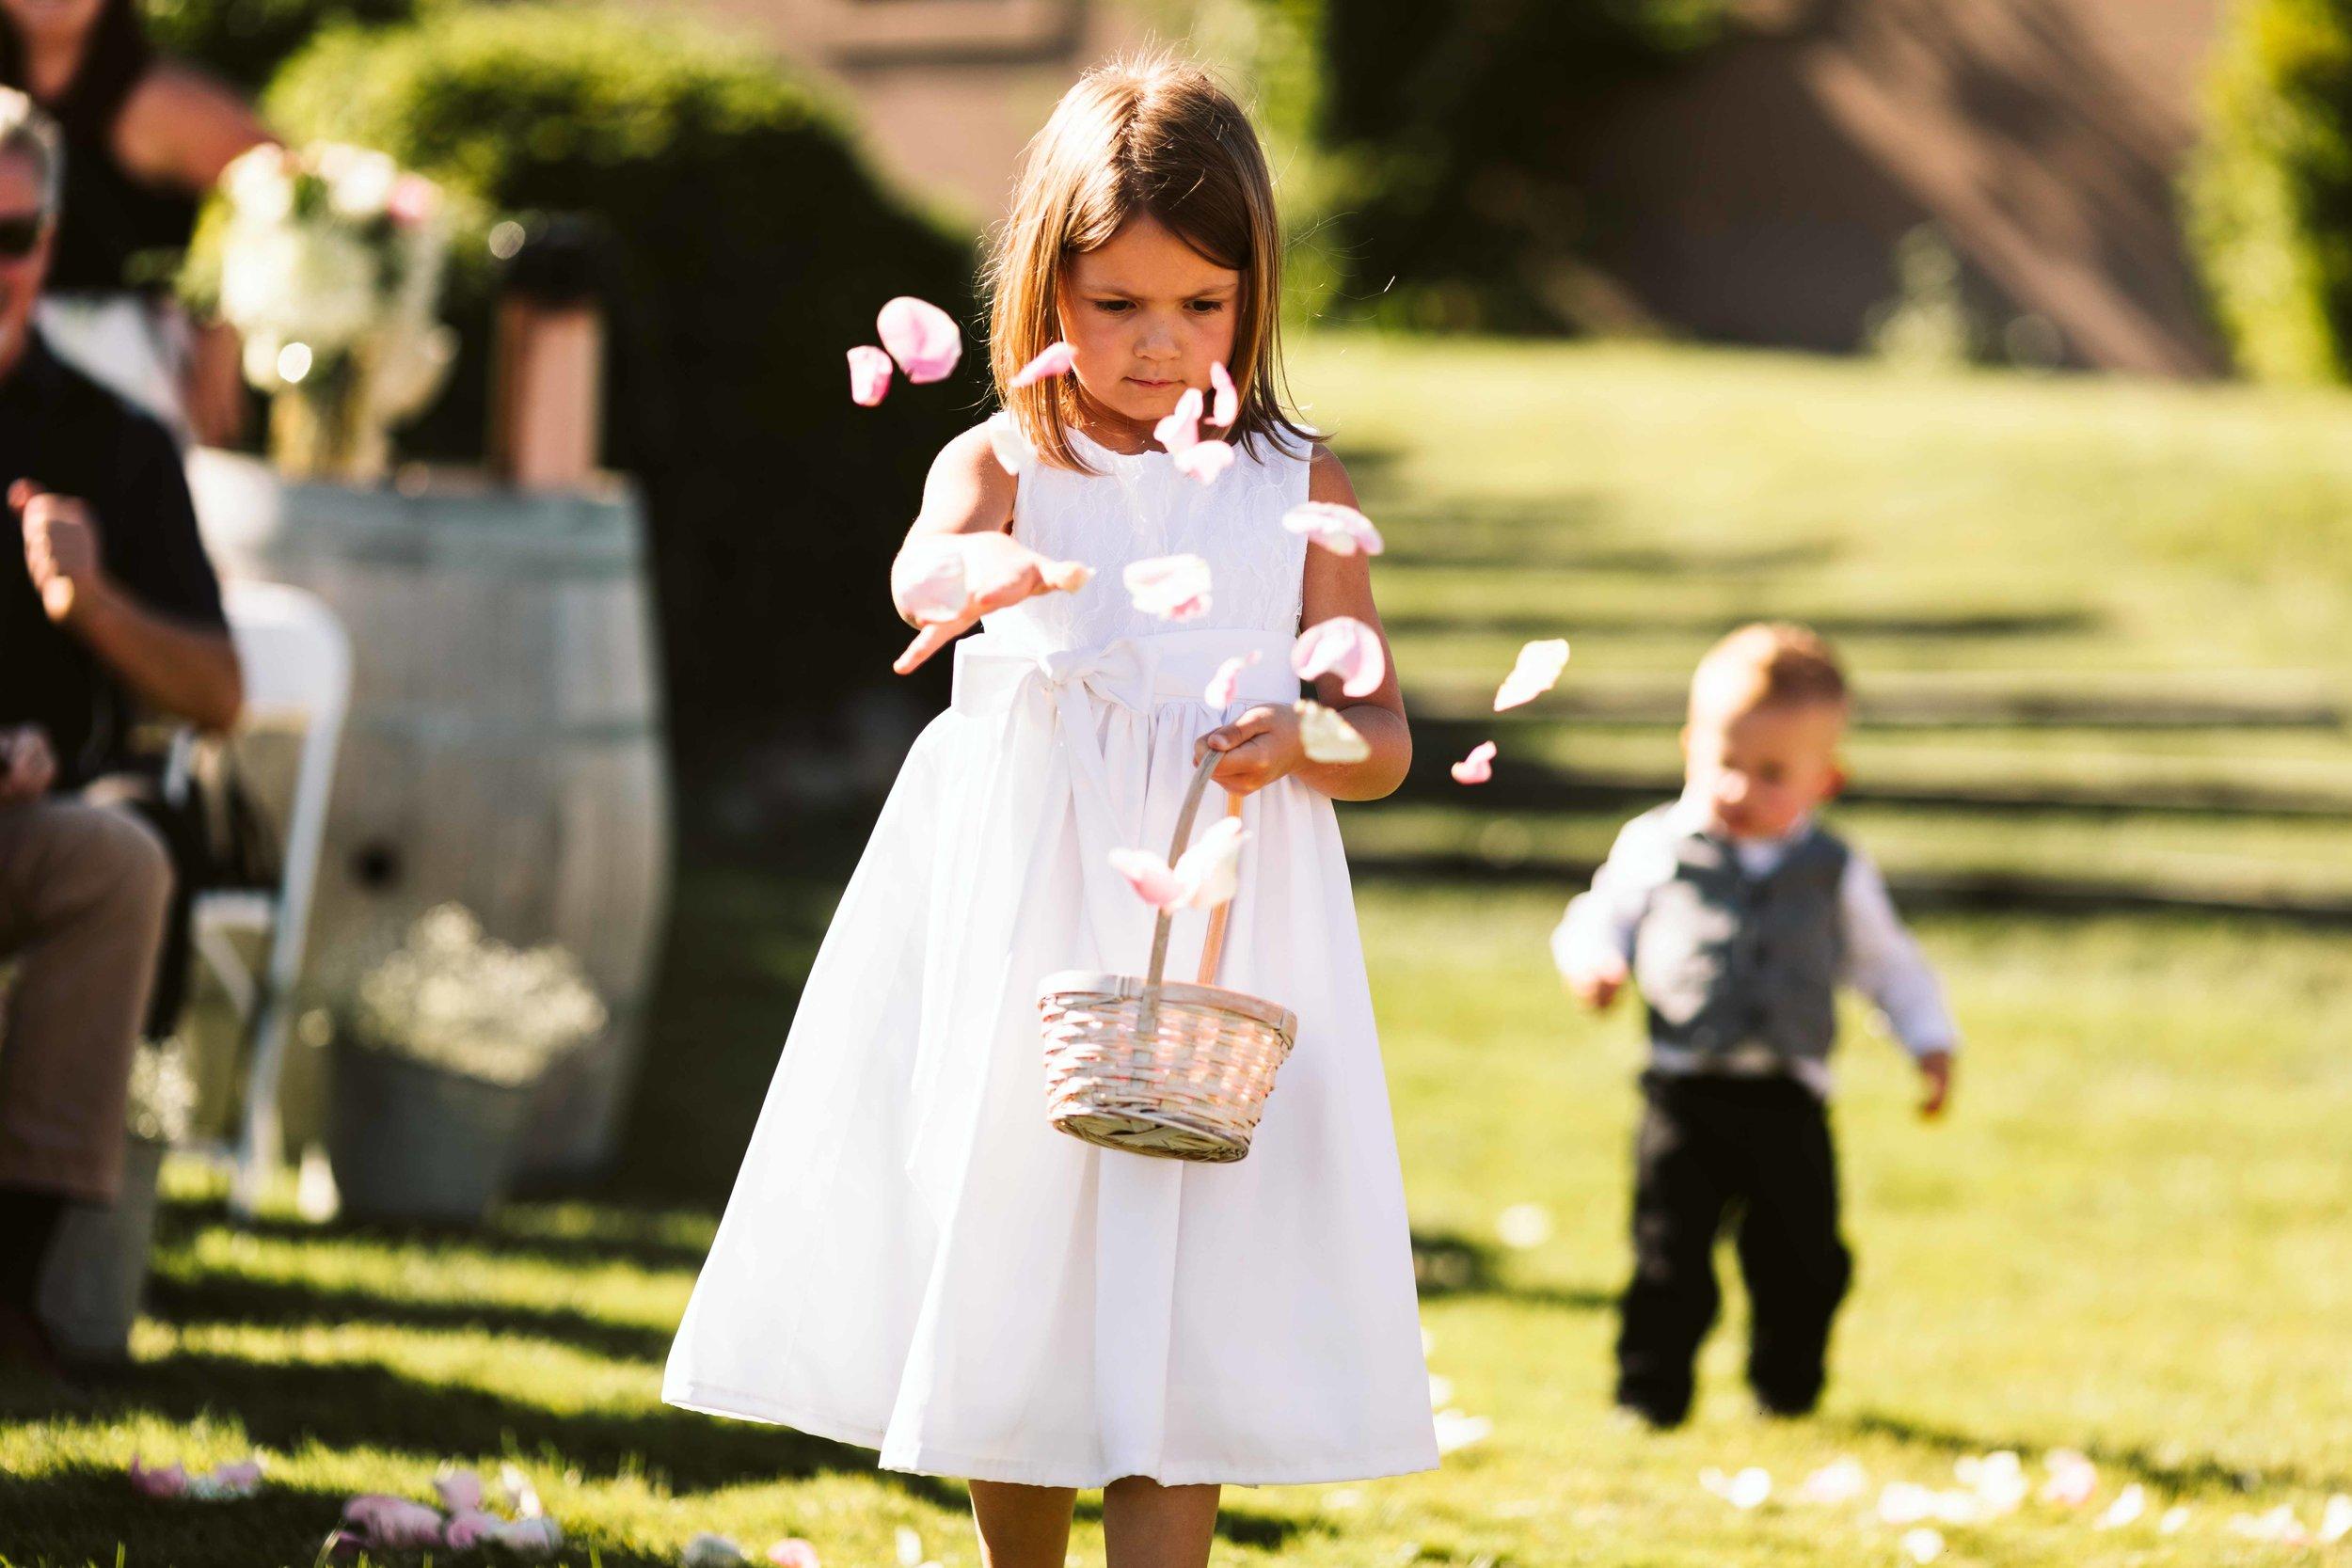 fontaine-estates-wedding-58.jpg